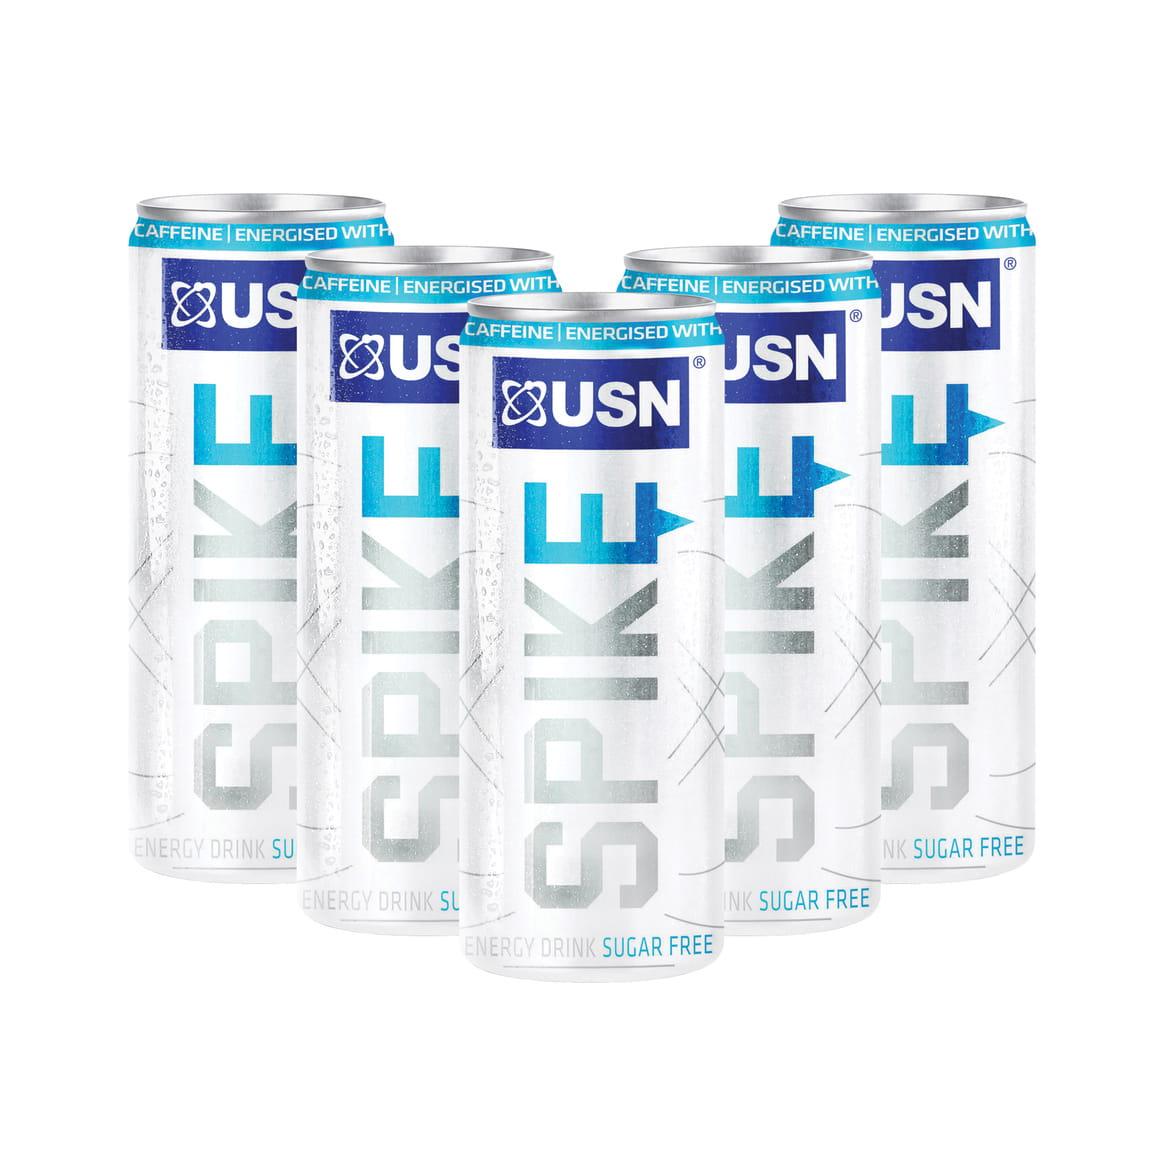 USN Spike Sugar Free Energy Drink, 24x250ml